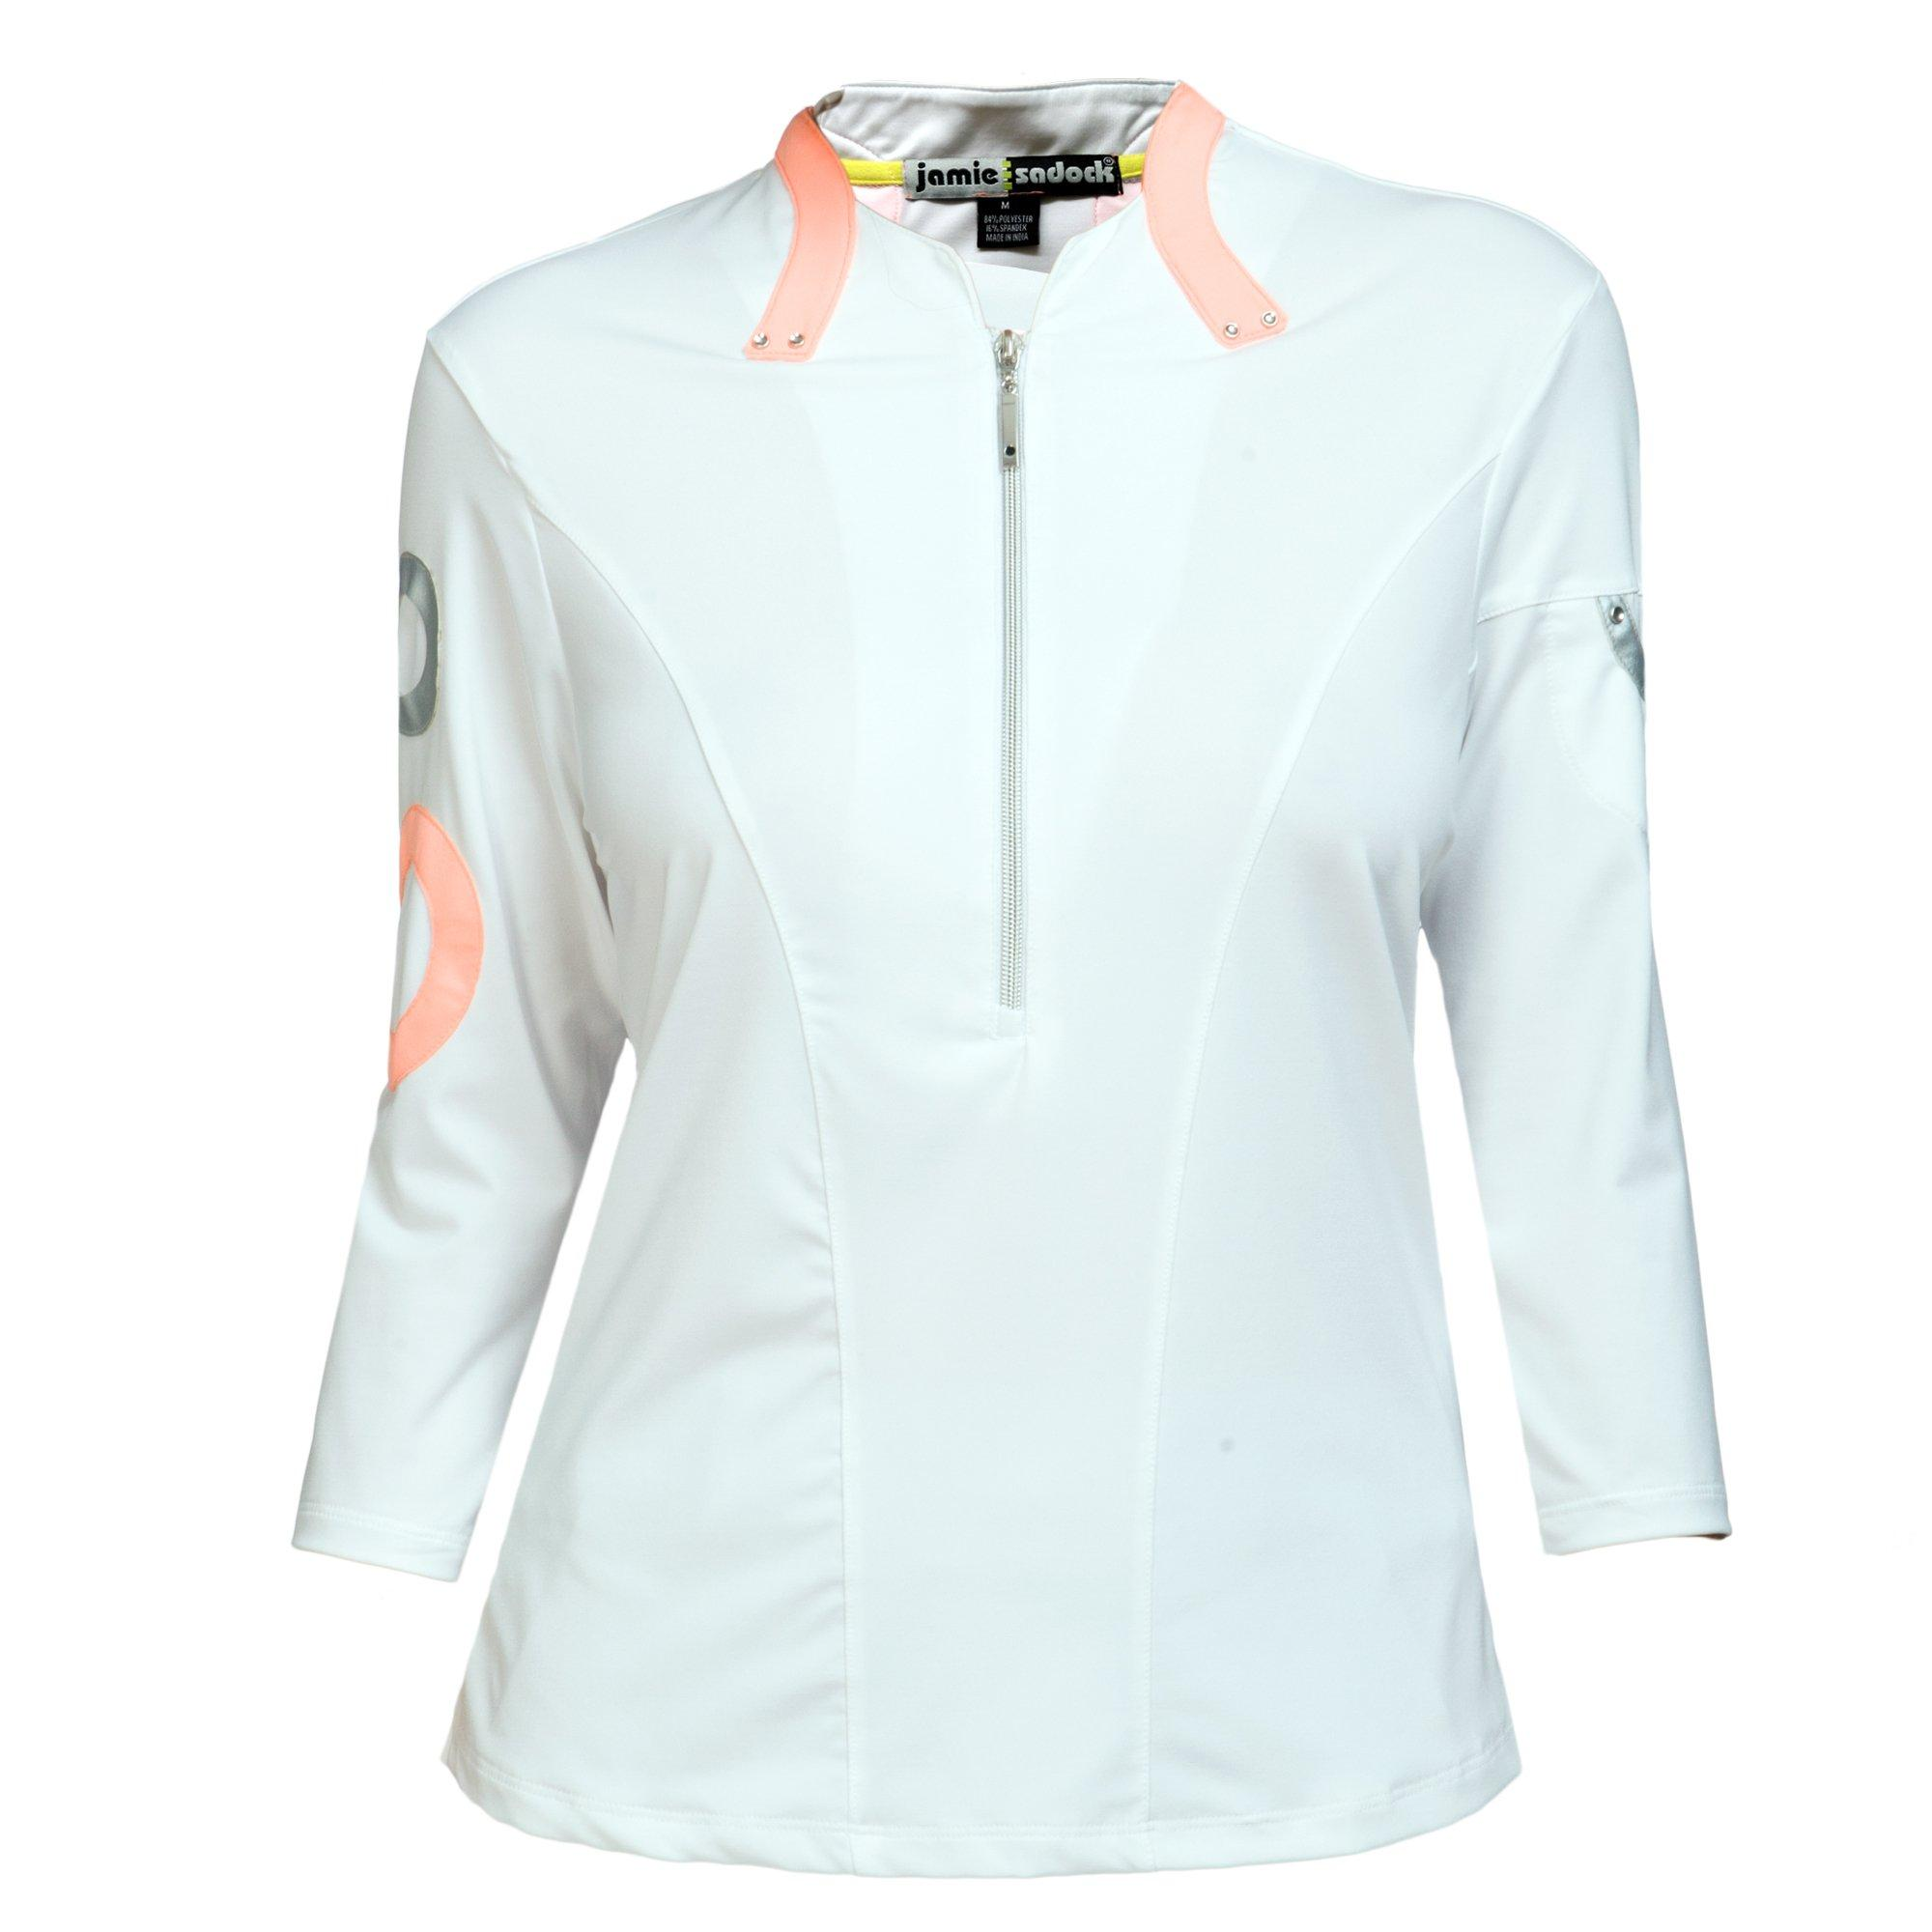 Women's 3/4 Sleeve Gleam Top